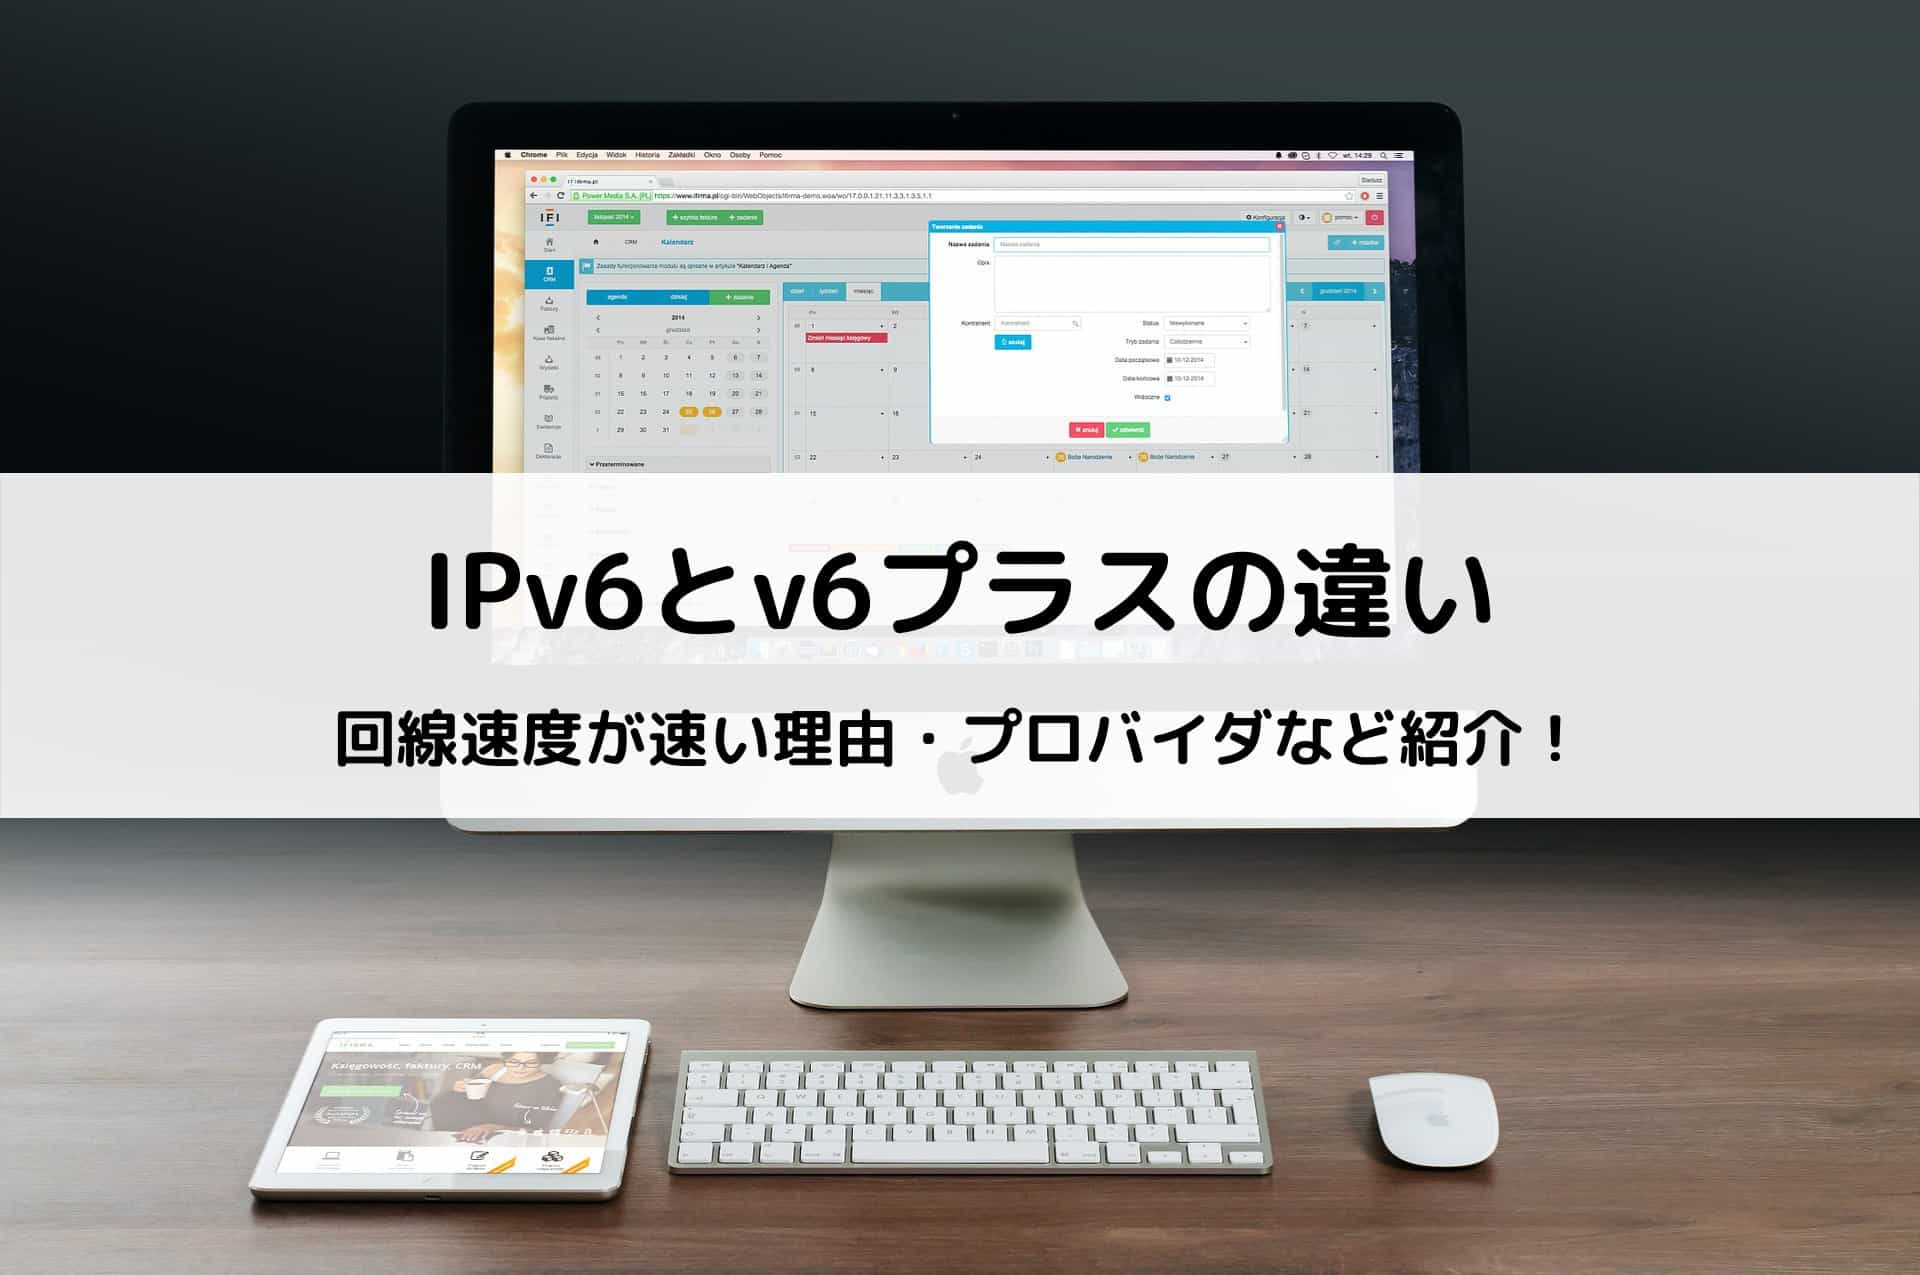 IPv6とv6プラスの違い|回線速度が速い理由や対応プロバイダなど紹介!